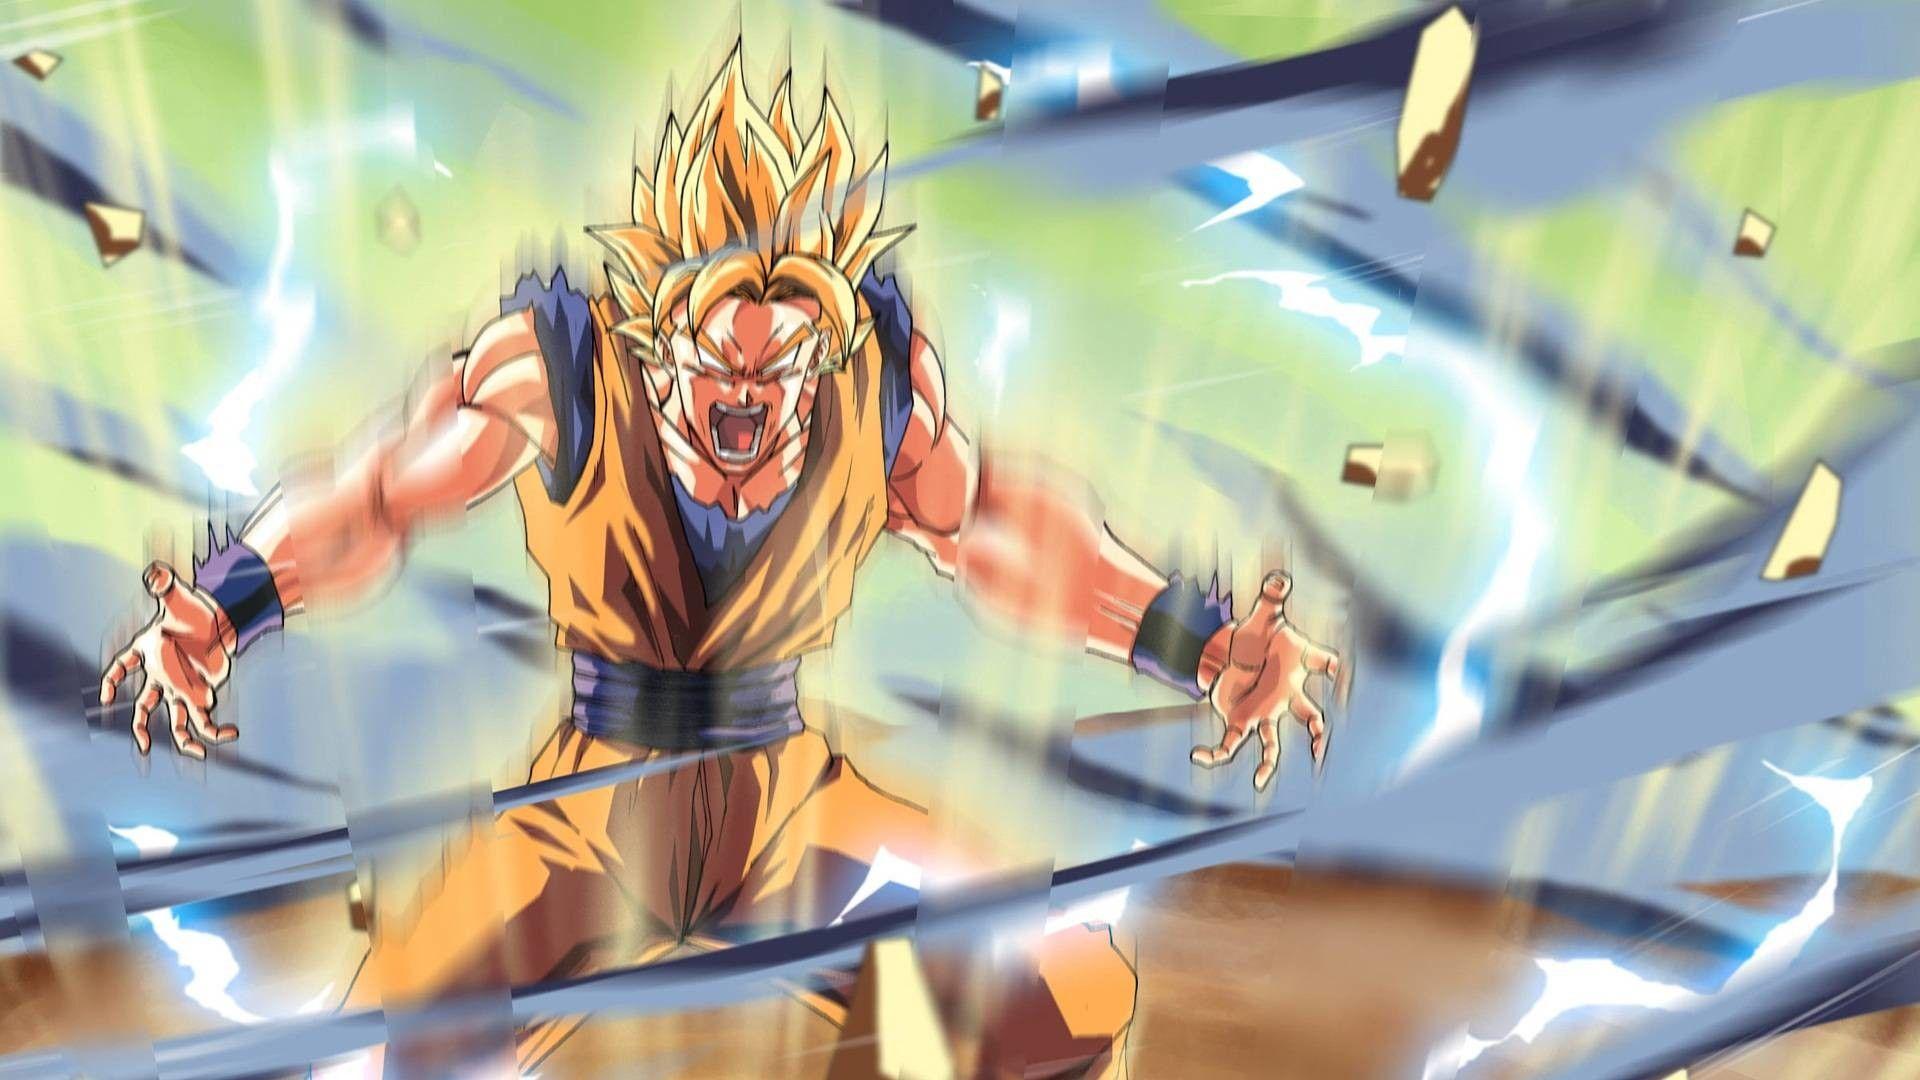 1920x1080 Dbz Wallpaper Goku Kamehameha Dragon Ball Z Dragon Ball